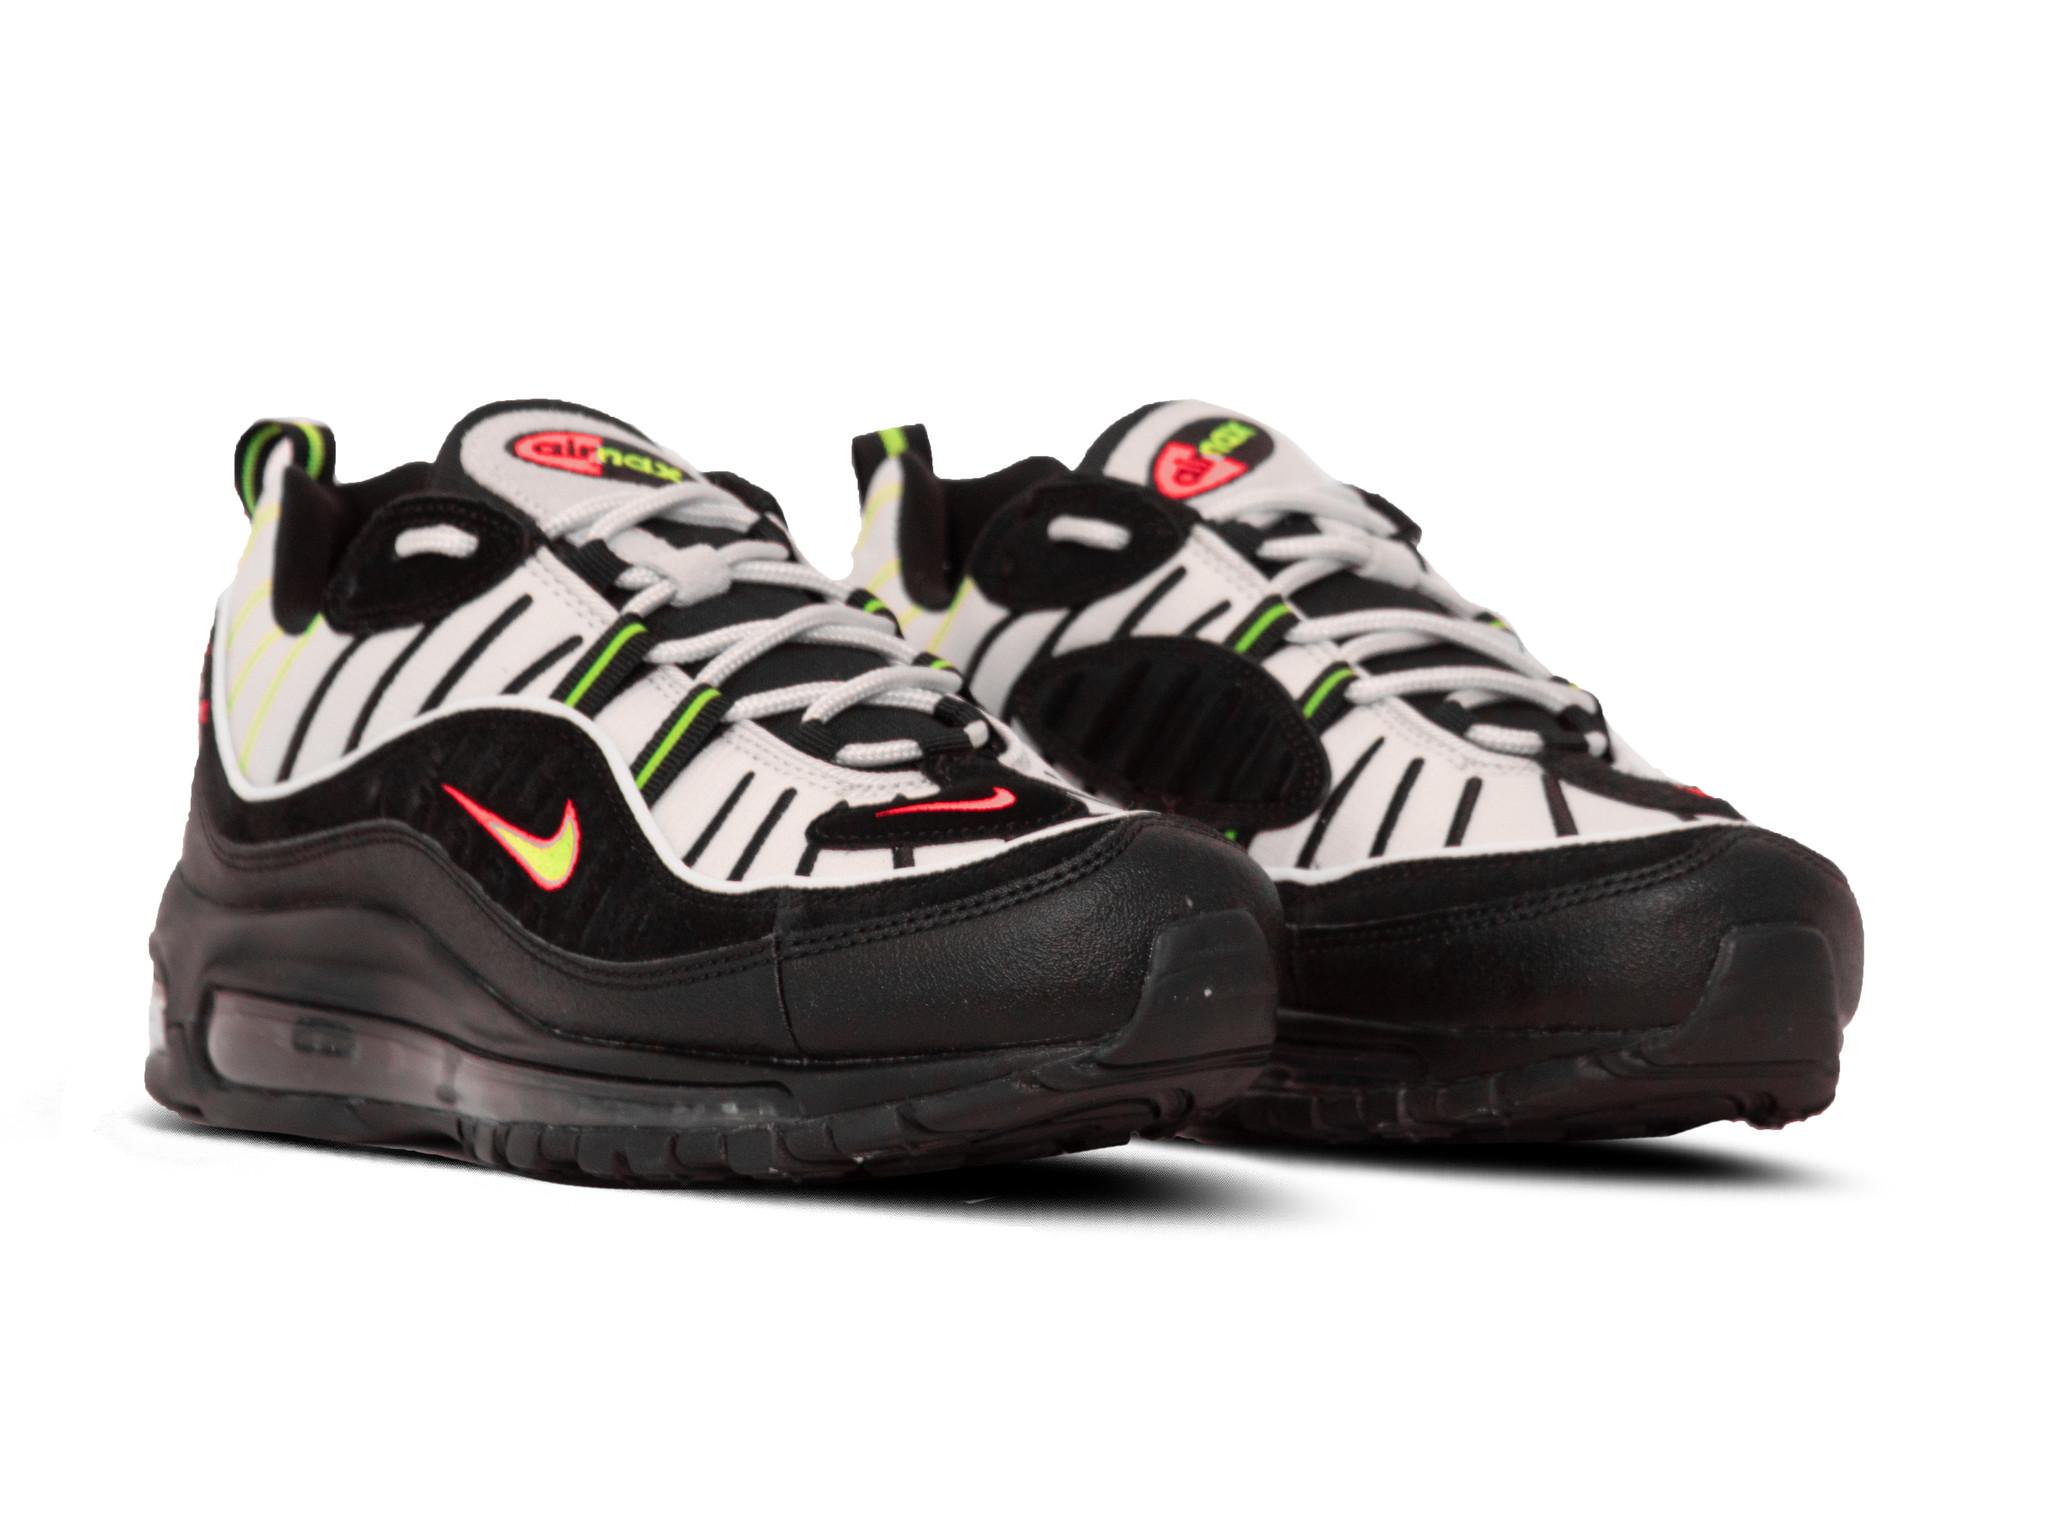 Air Max 98 Platinum Tint Black Electric Green 640744 015